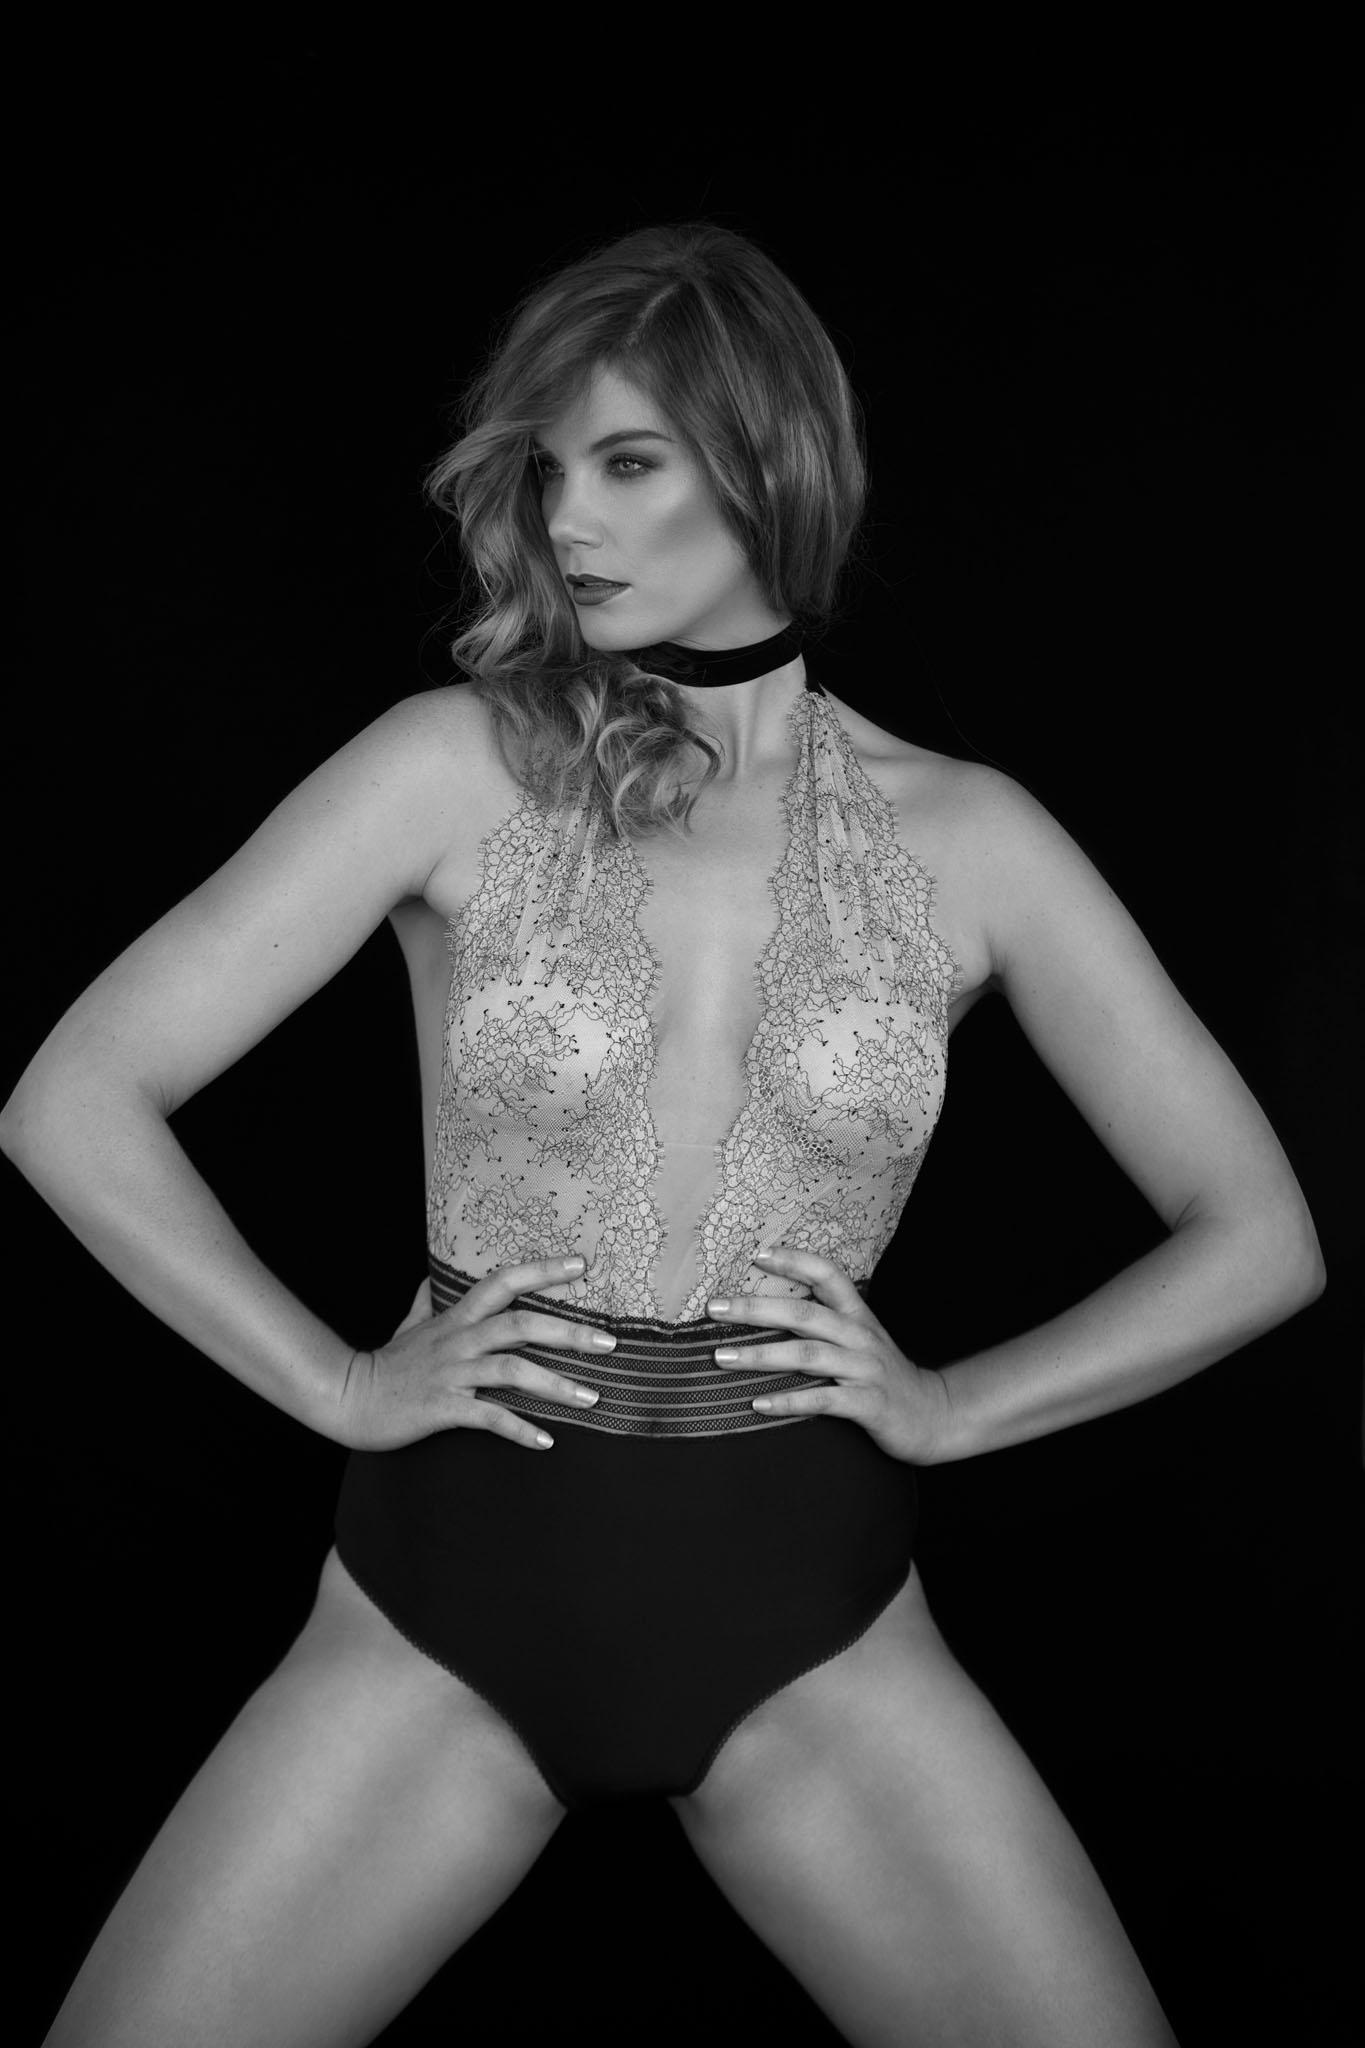 Claryssa Hummenj-Jameson8082